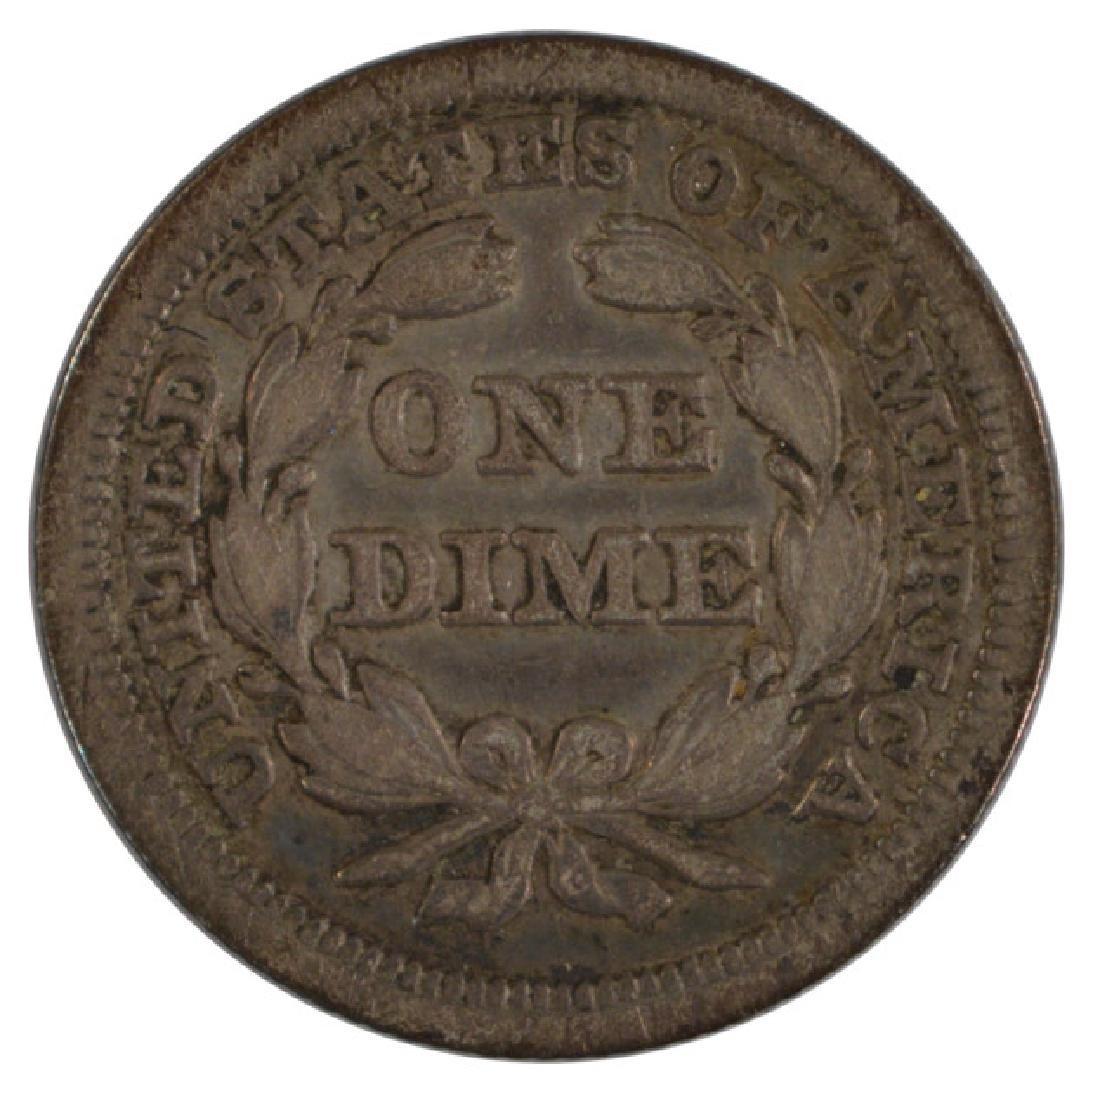 1847 Seated Liberty Dime - 2